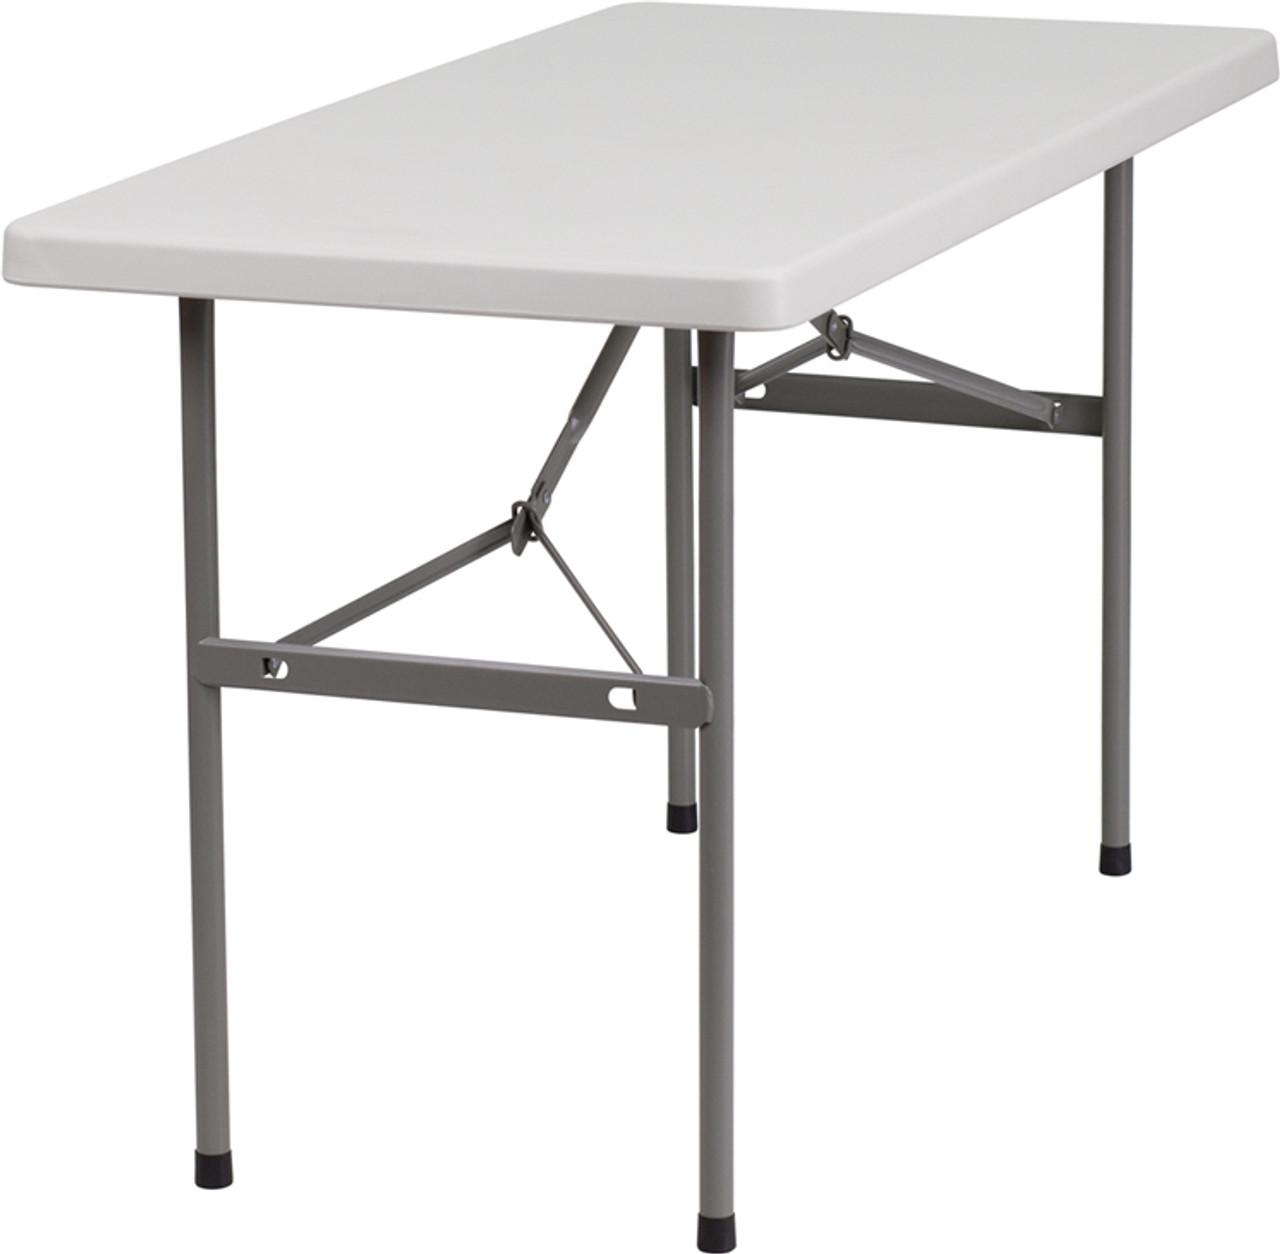 Rhinolite 24 X48 4 Ft Plastic Folding Table Solid One Piece Top Locking Steel Frame Foldingchairsandtables Com